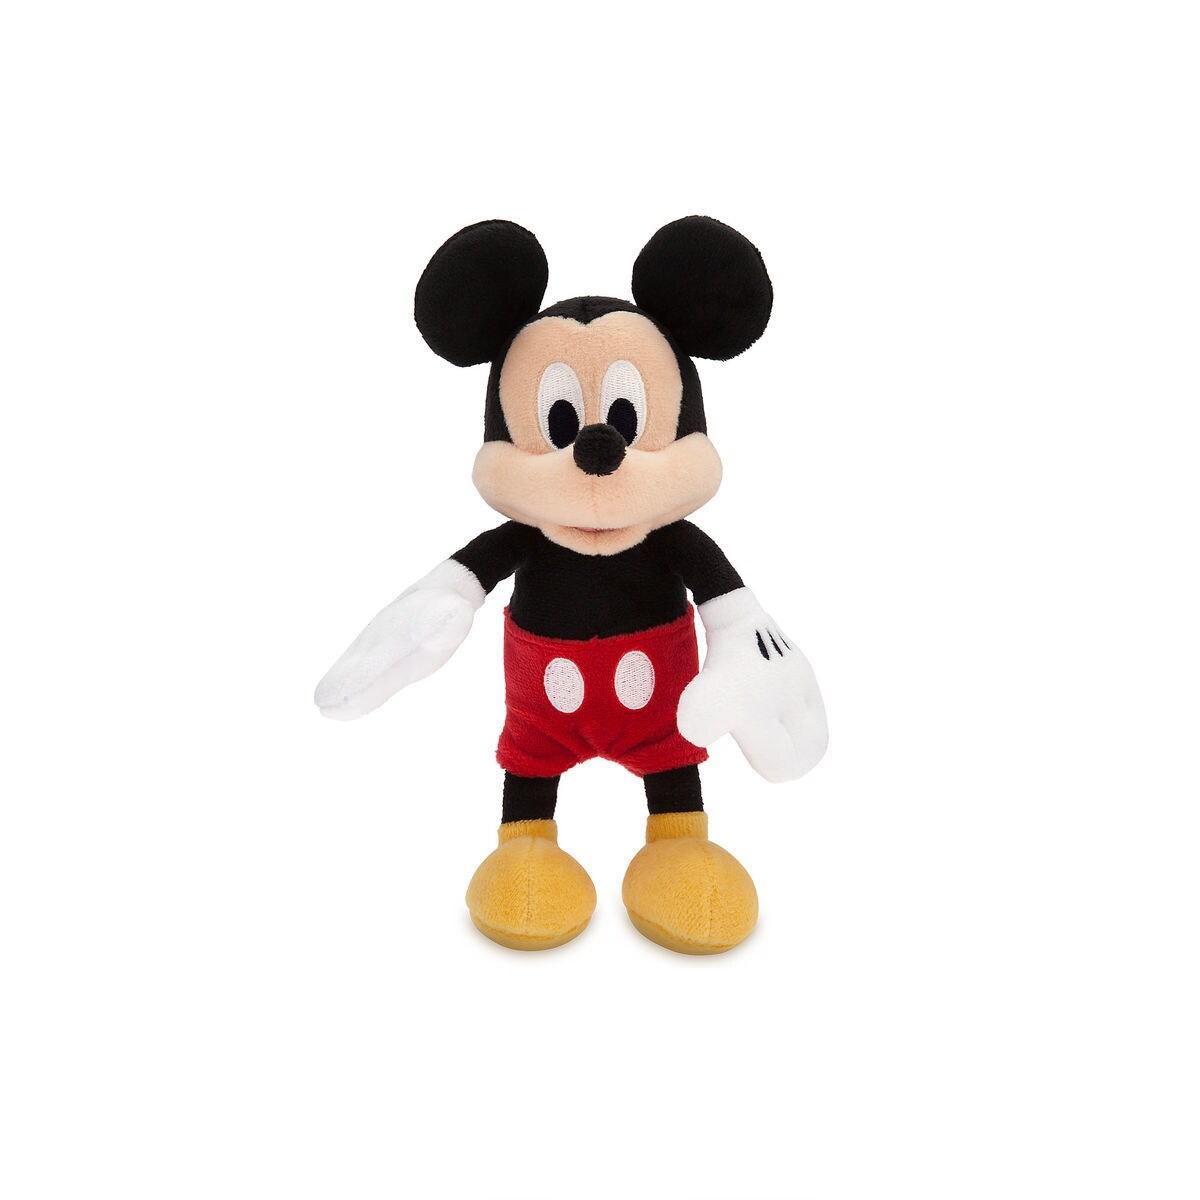 Mickey Mouse Plush Mini Bean Bag 9 Personalized Shopdisney